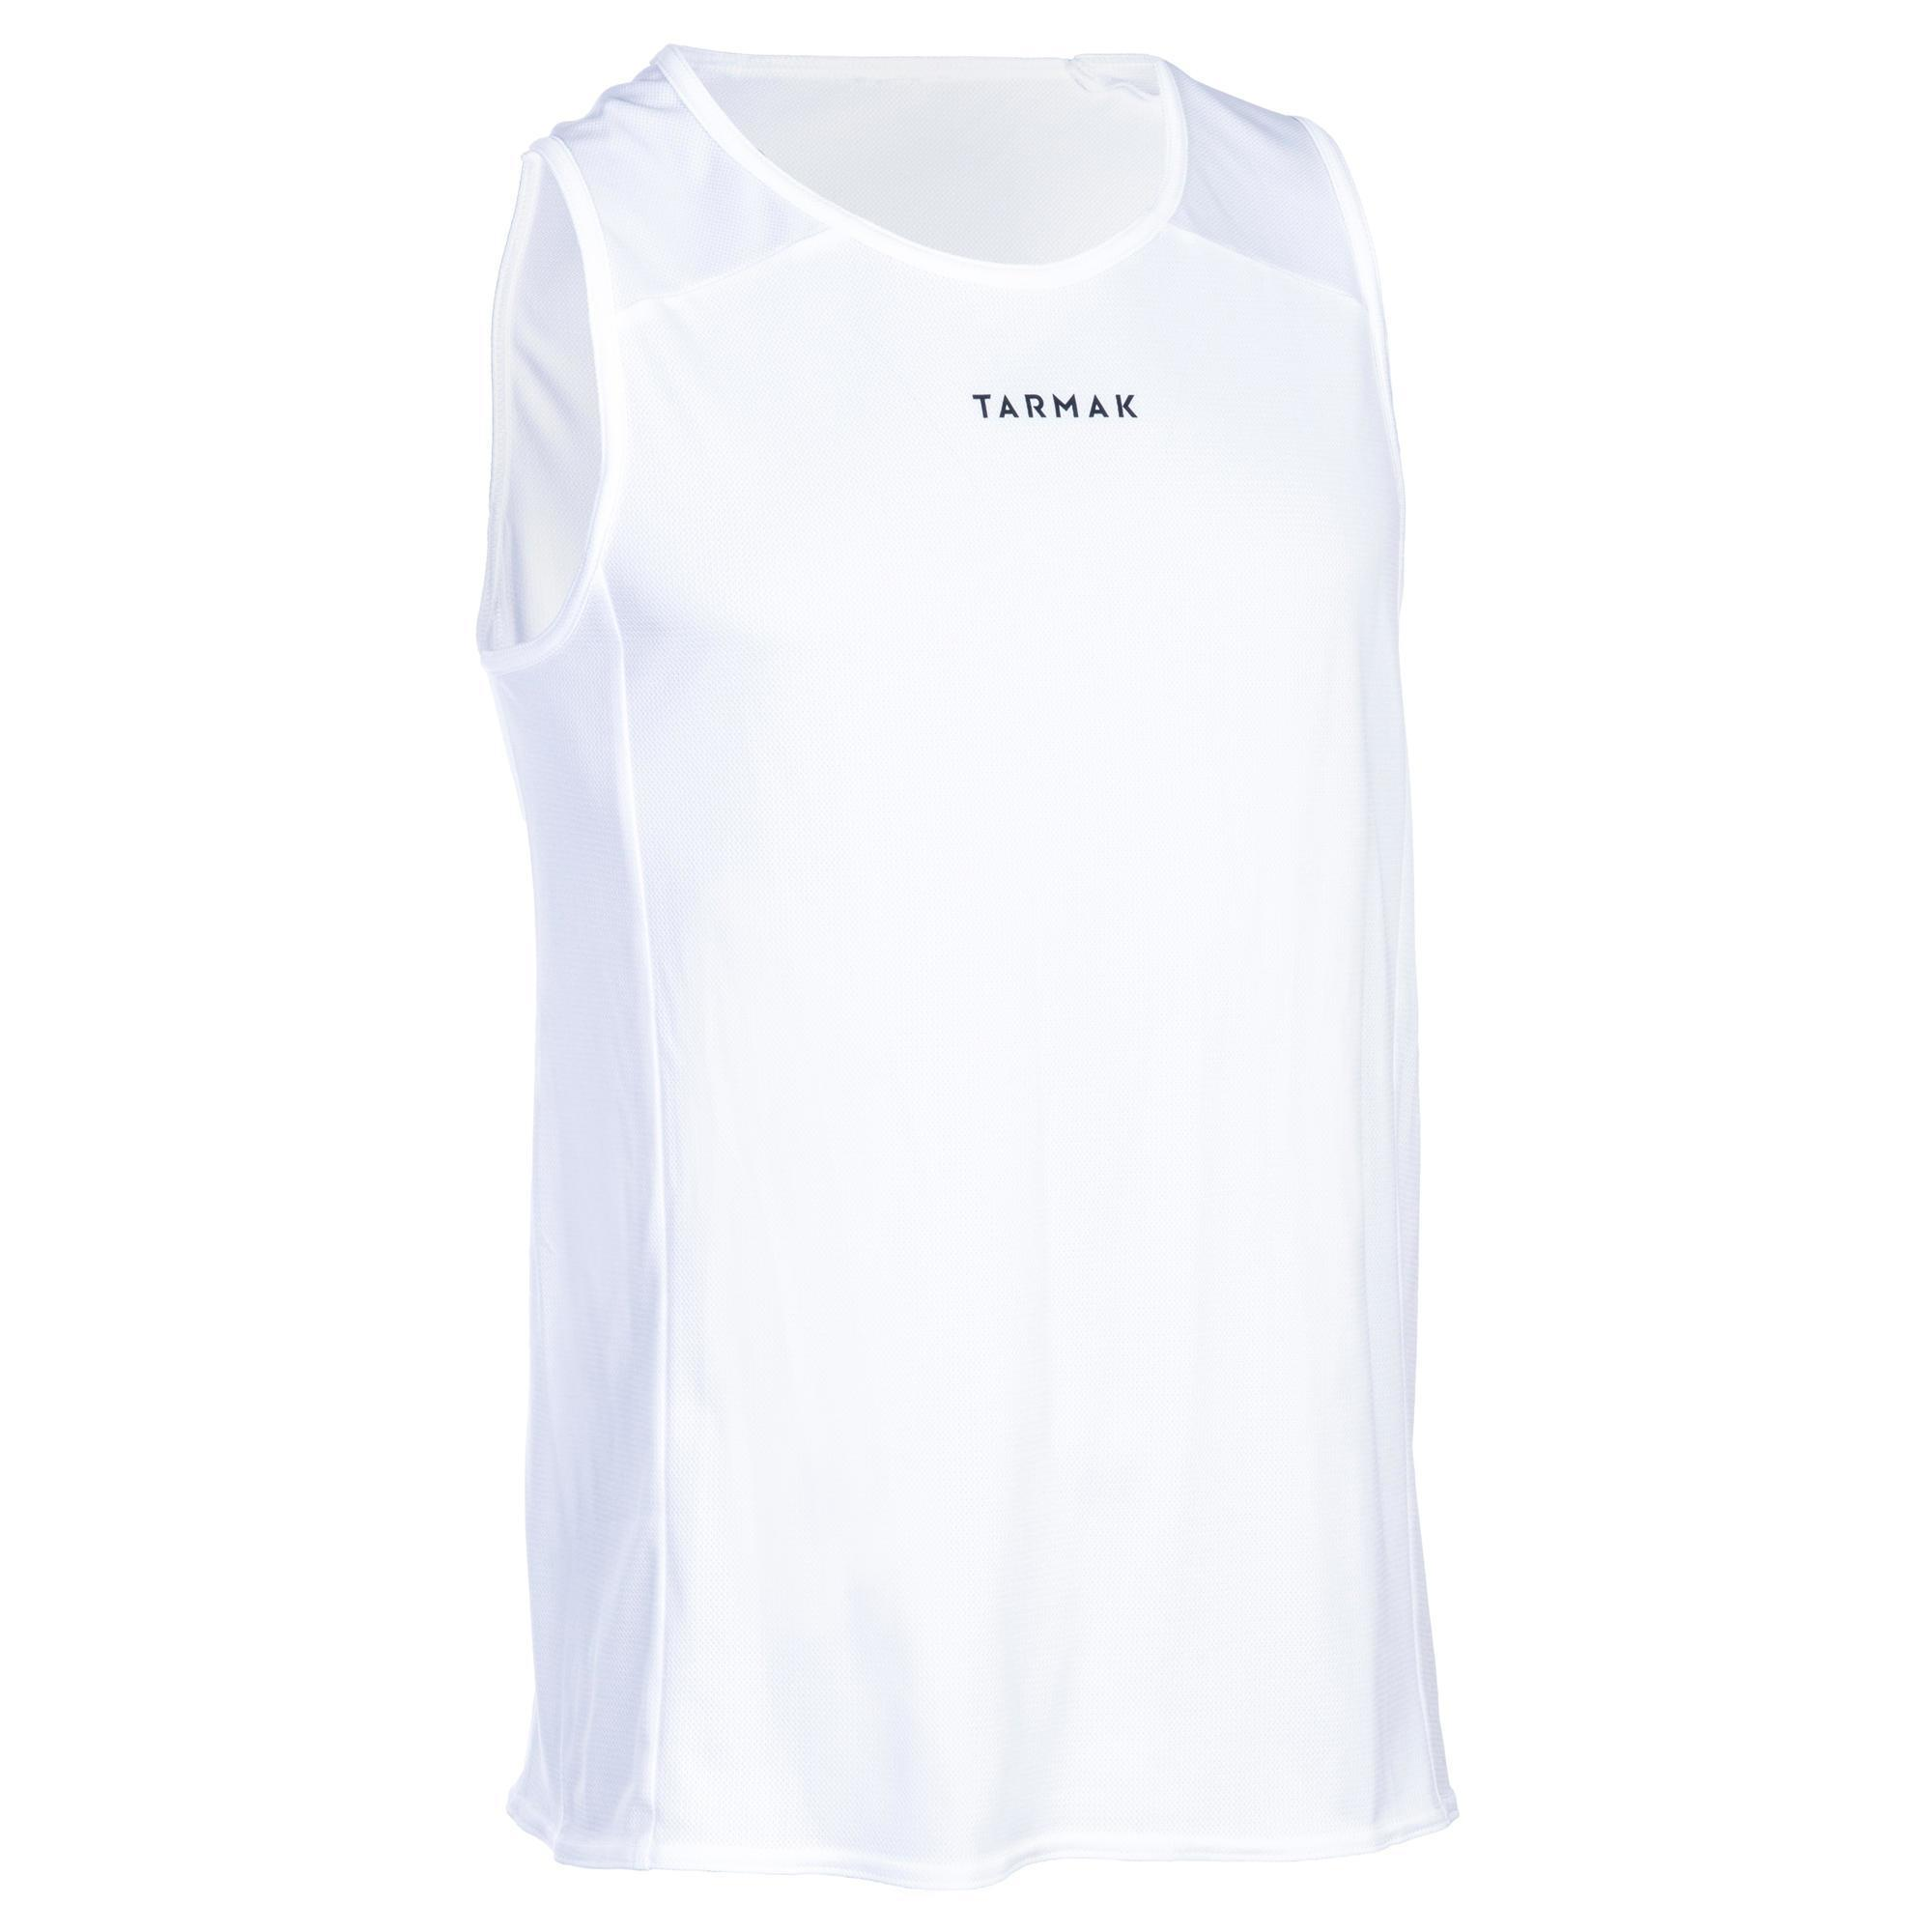 Tarmak Basketbalshirt T100 wit (heren)